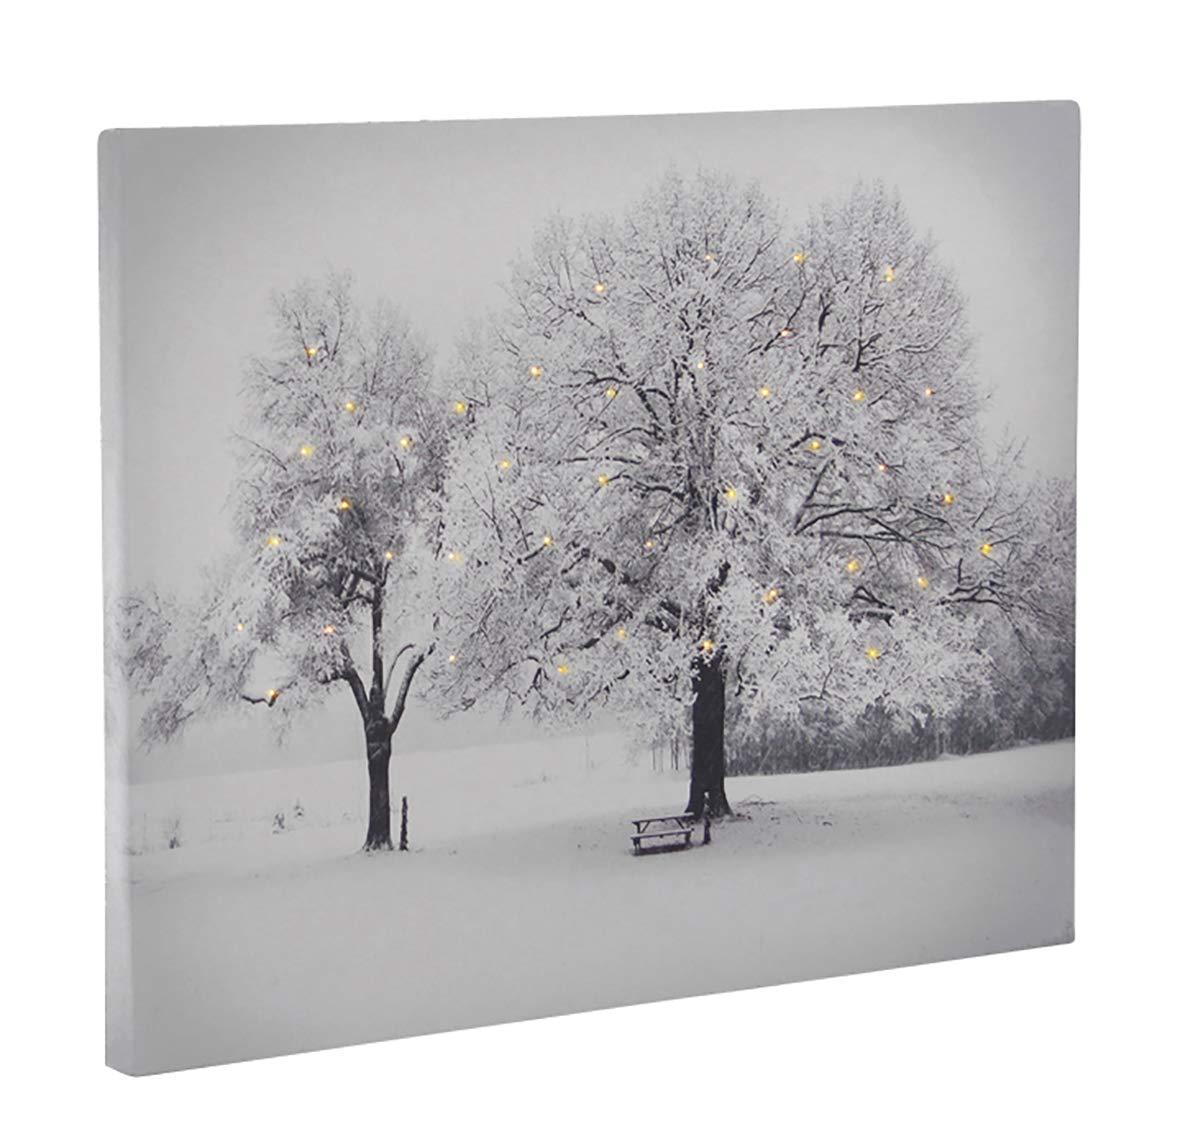 Leinwandbild mit LED-Beleuchtung 30 x 40 cm Wandbild Bä ume 40 Lichter Leuchtbild LED-Bild Fachhandel-Plus